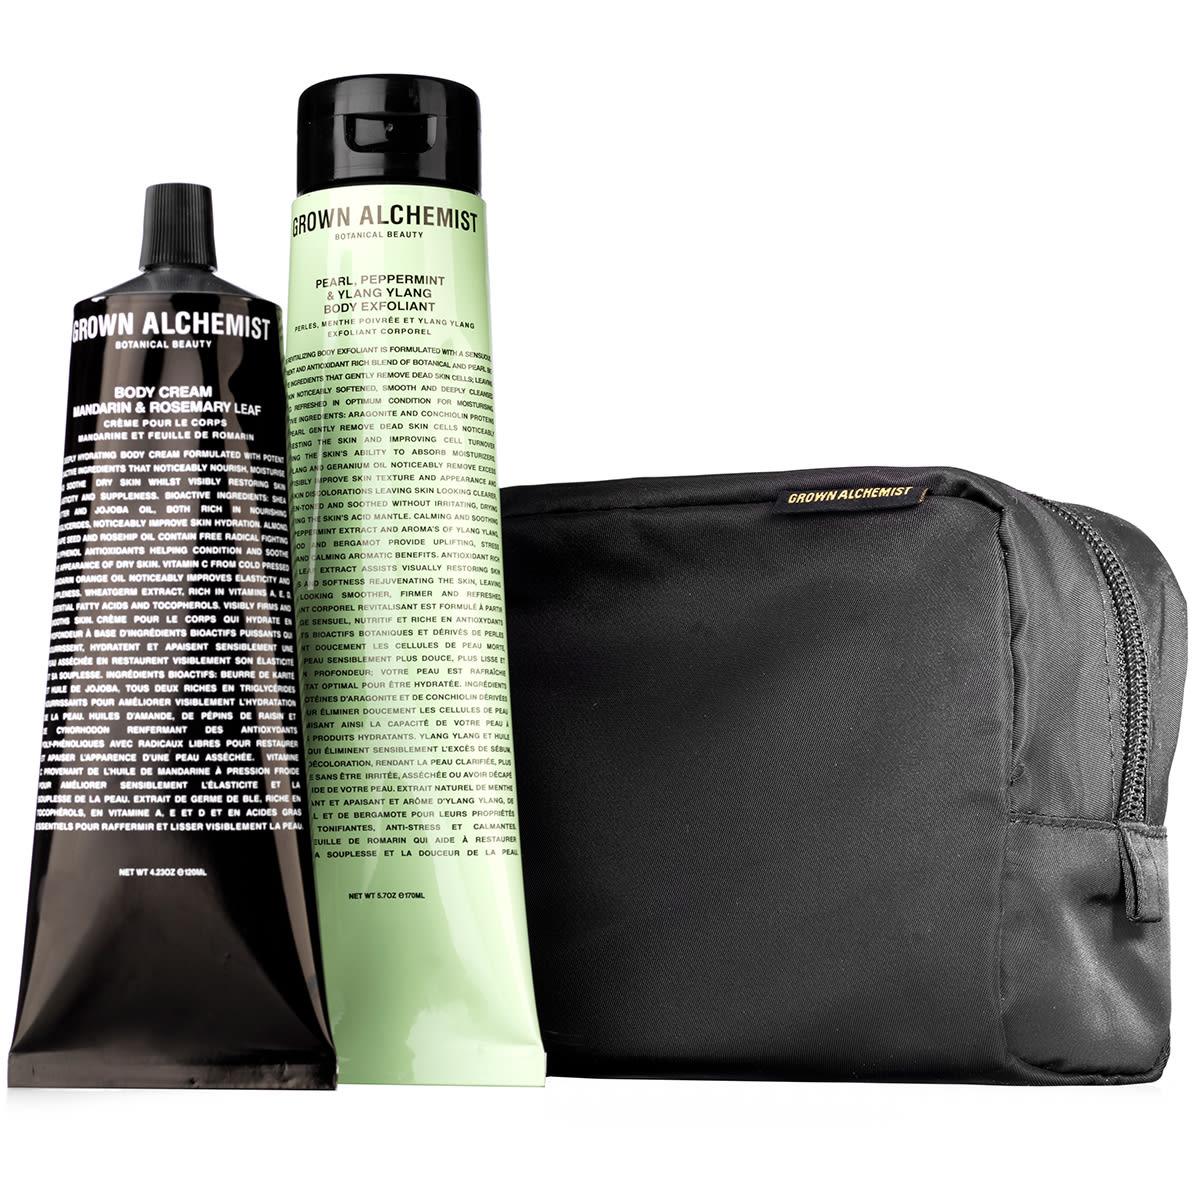 Gaveæske med bodyscrub og bodycreme i taske